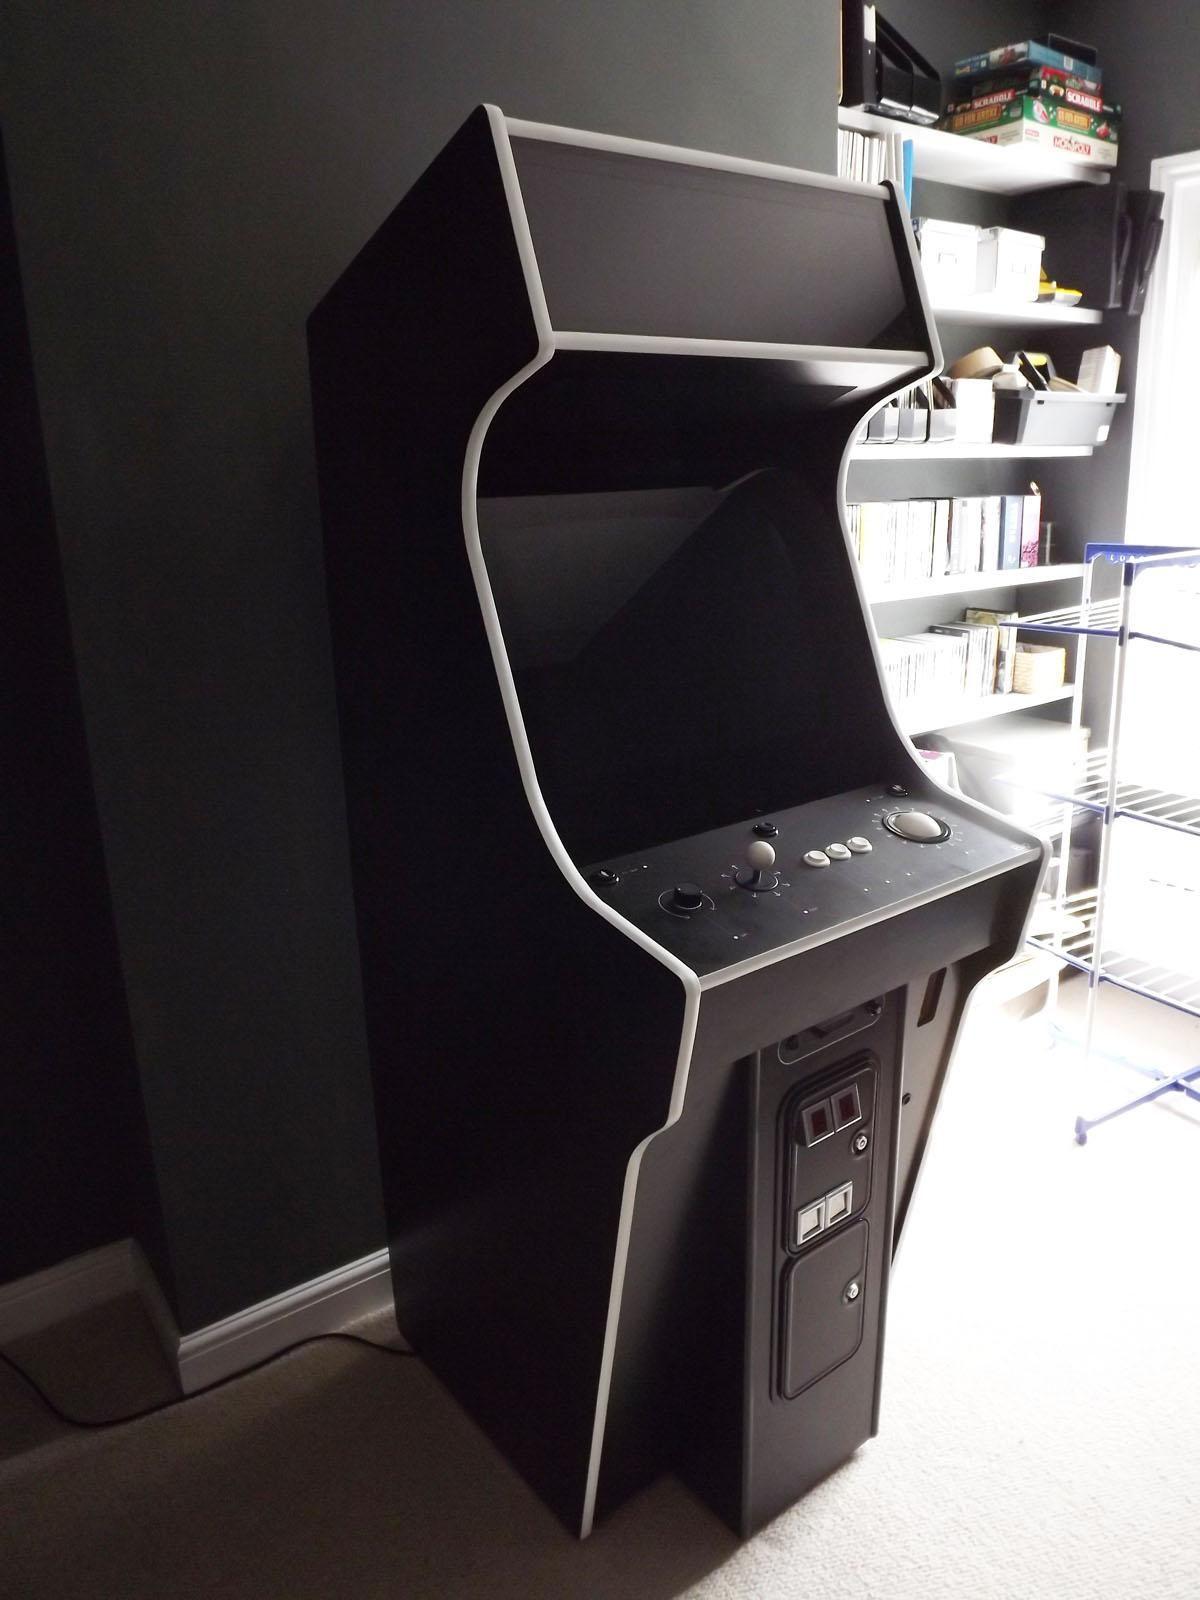 Blip plete Arcade Pinterest